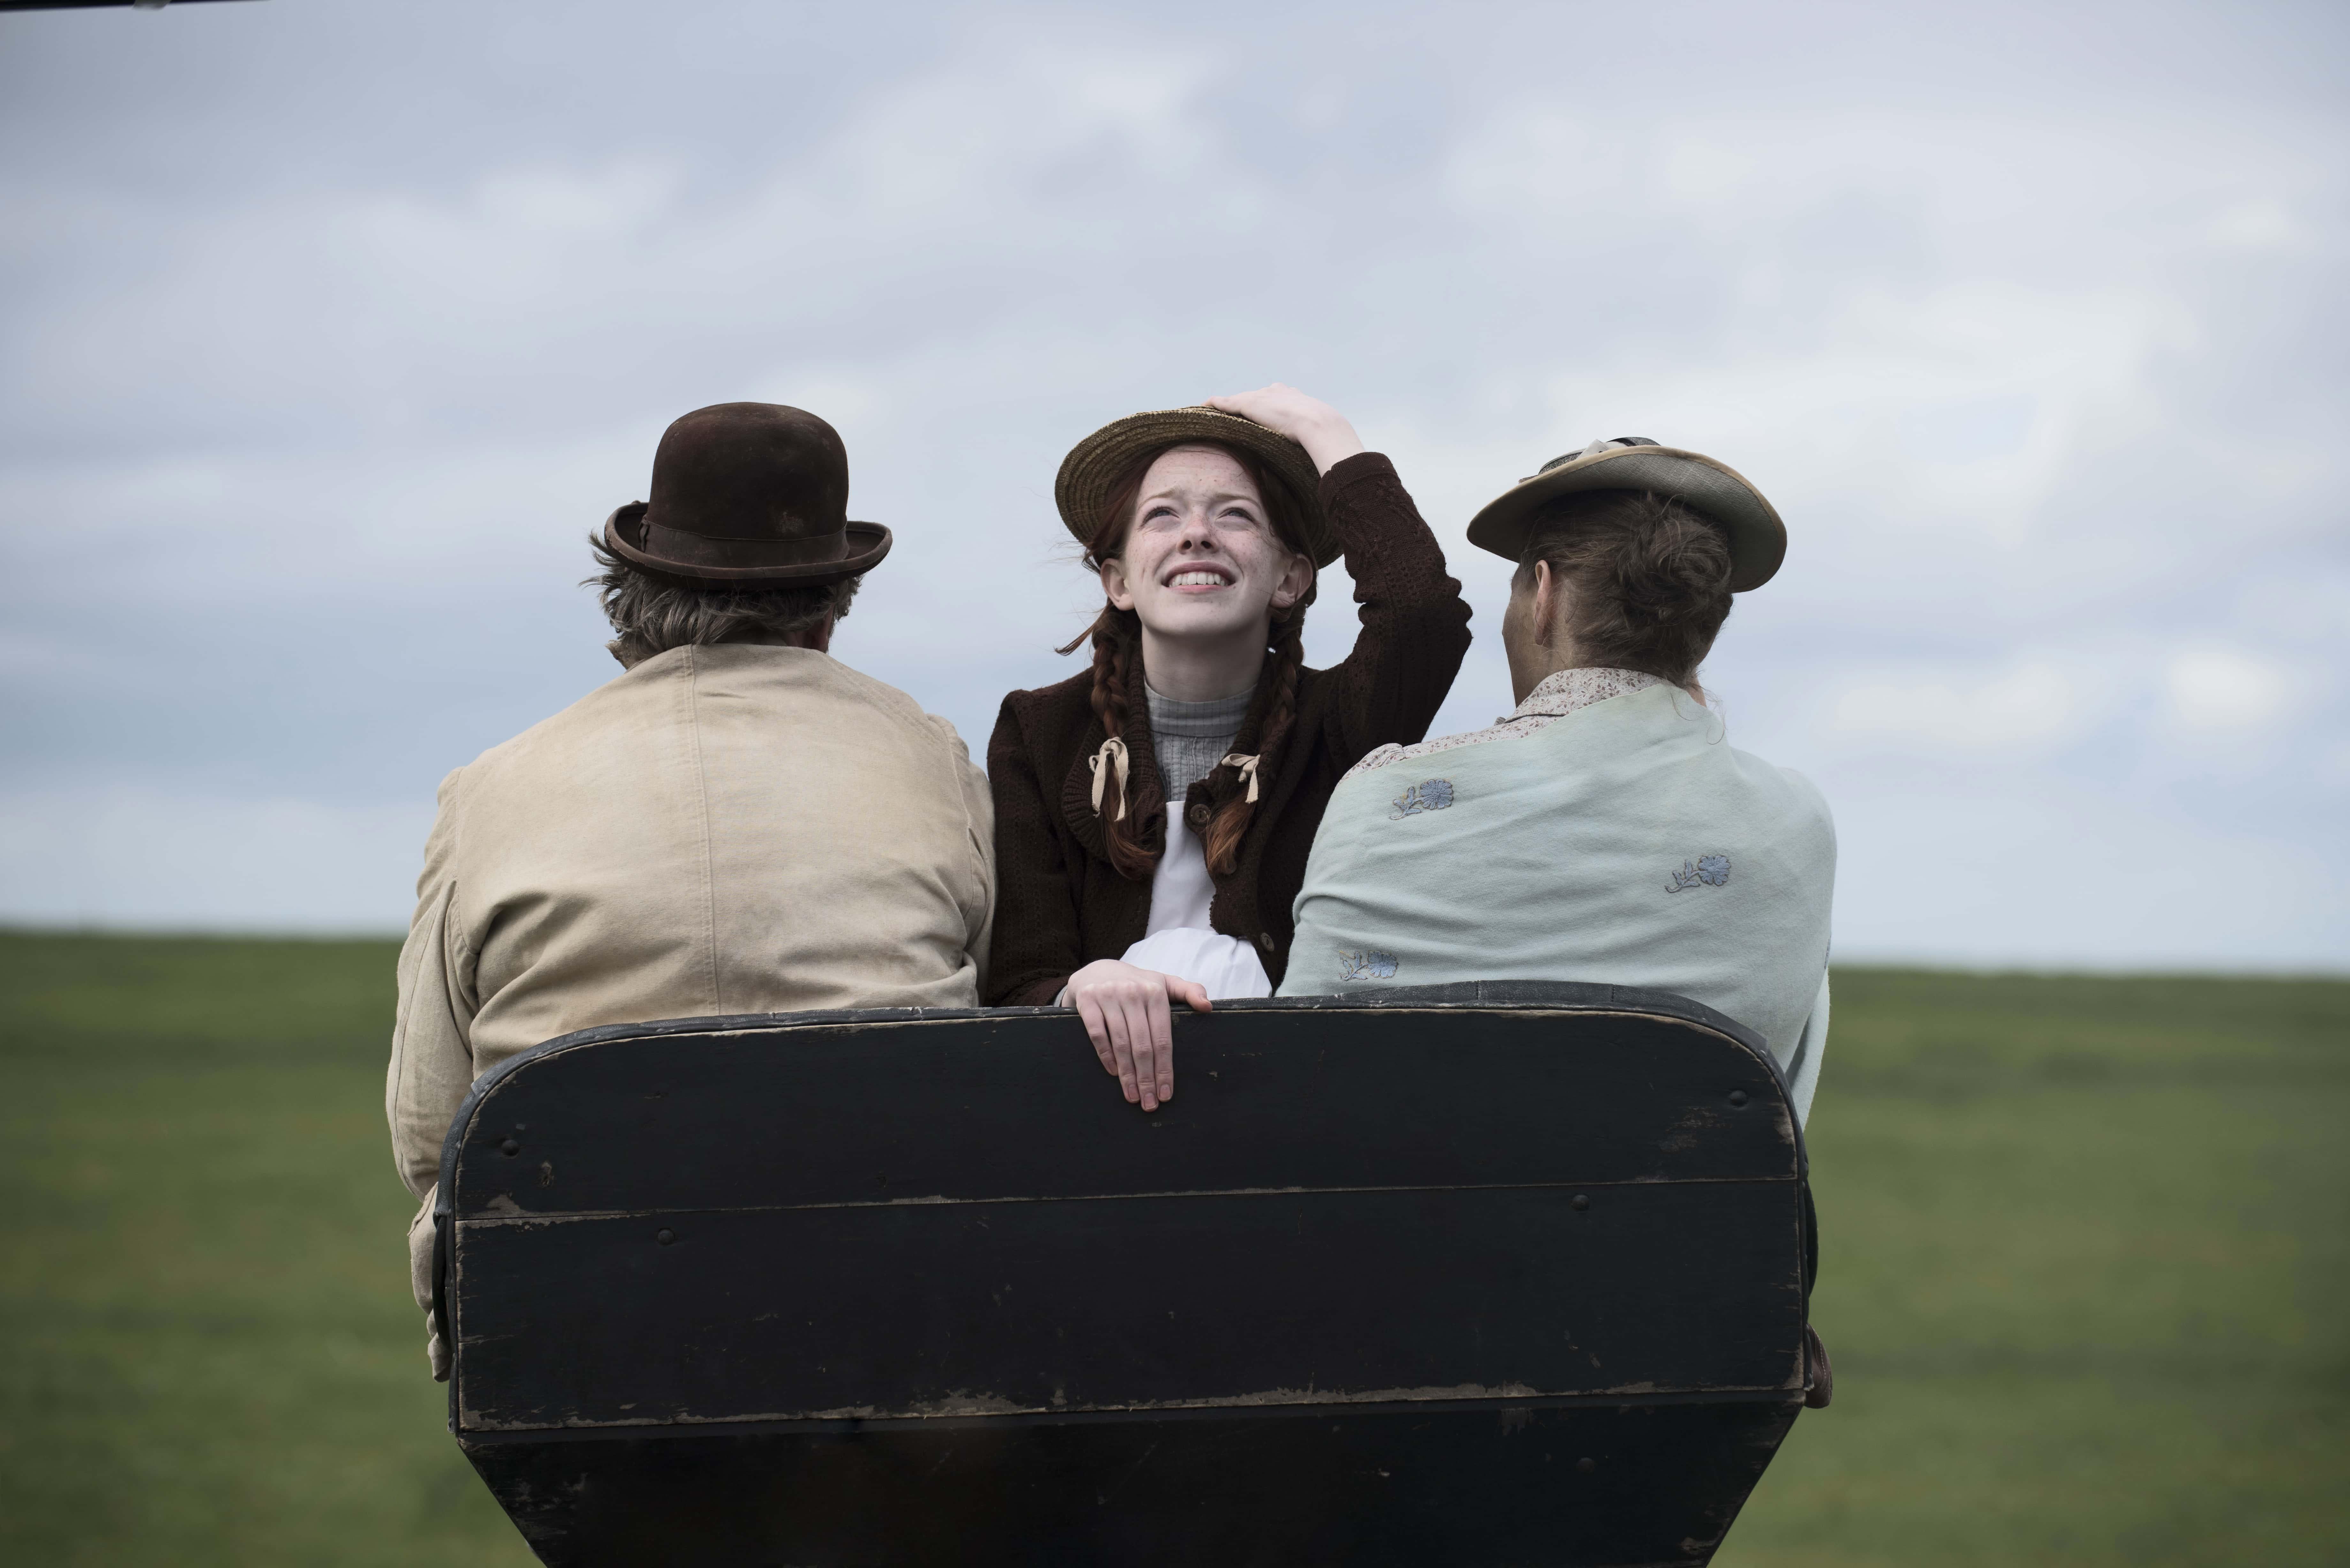 Anne with an E' Season 3: Release date, plot, cast, trailer